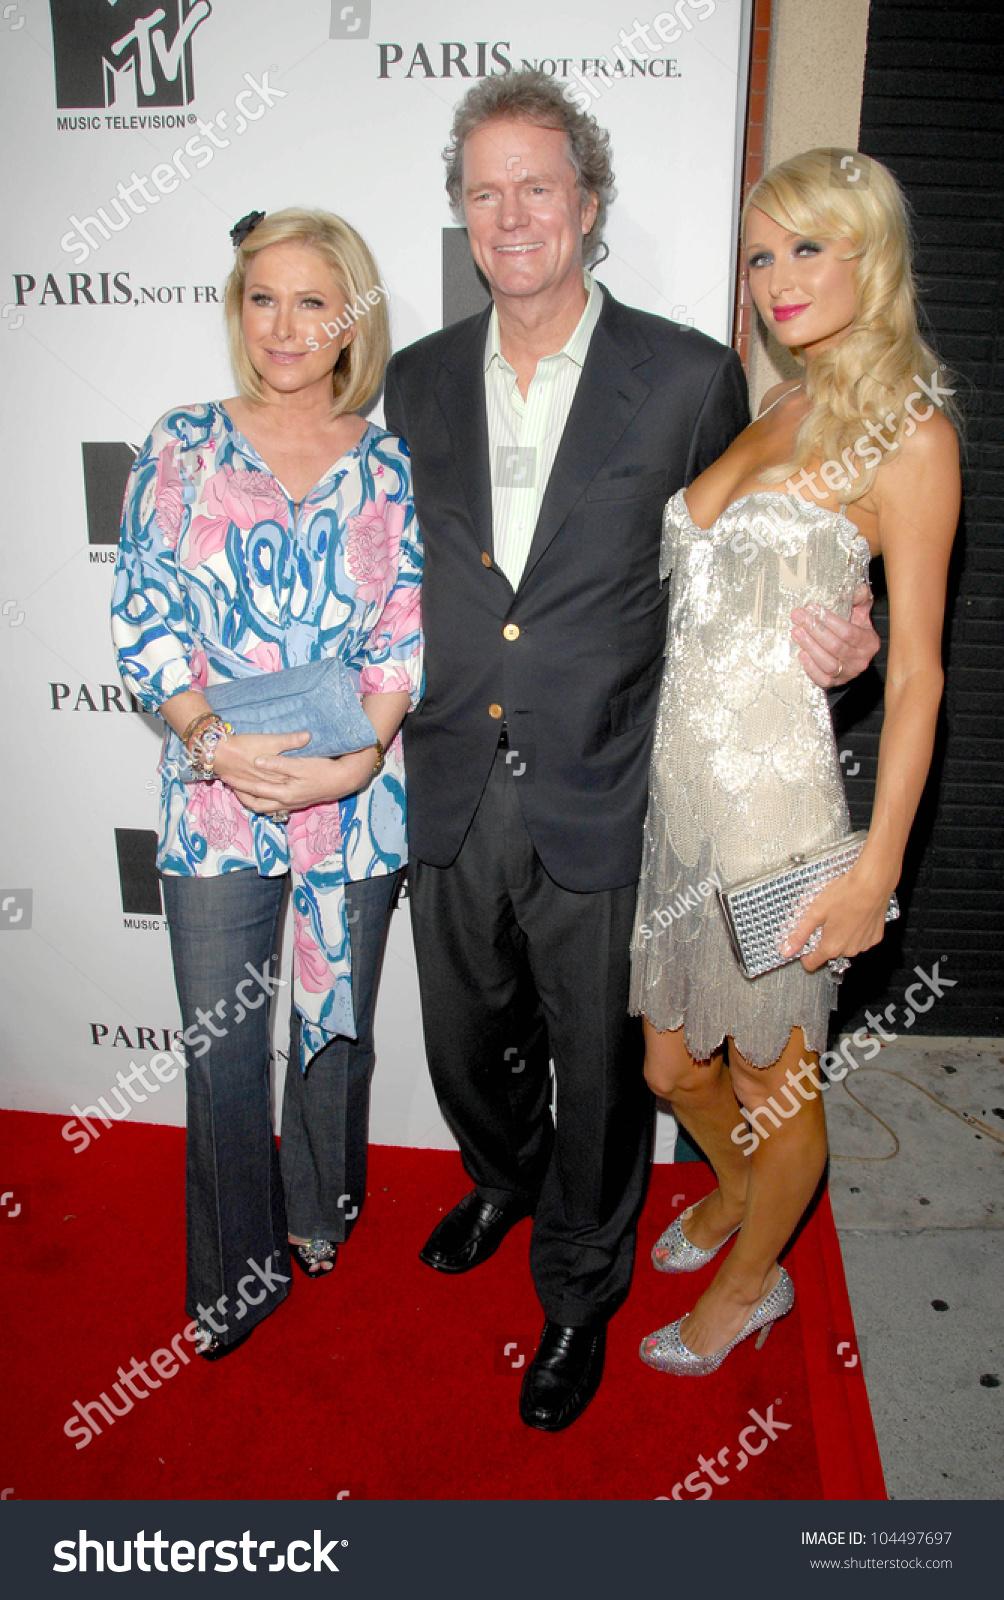 Kathy Hilton Rick Hilton Paris Hilton | Royalty-Free Stock Image